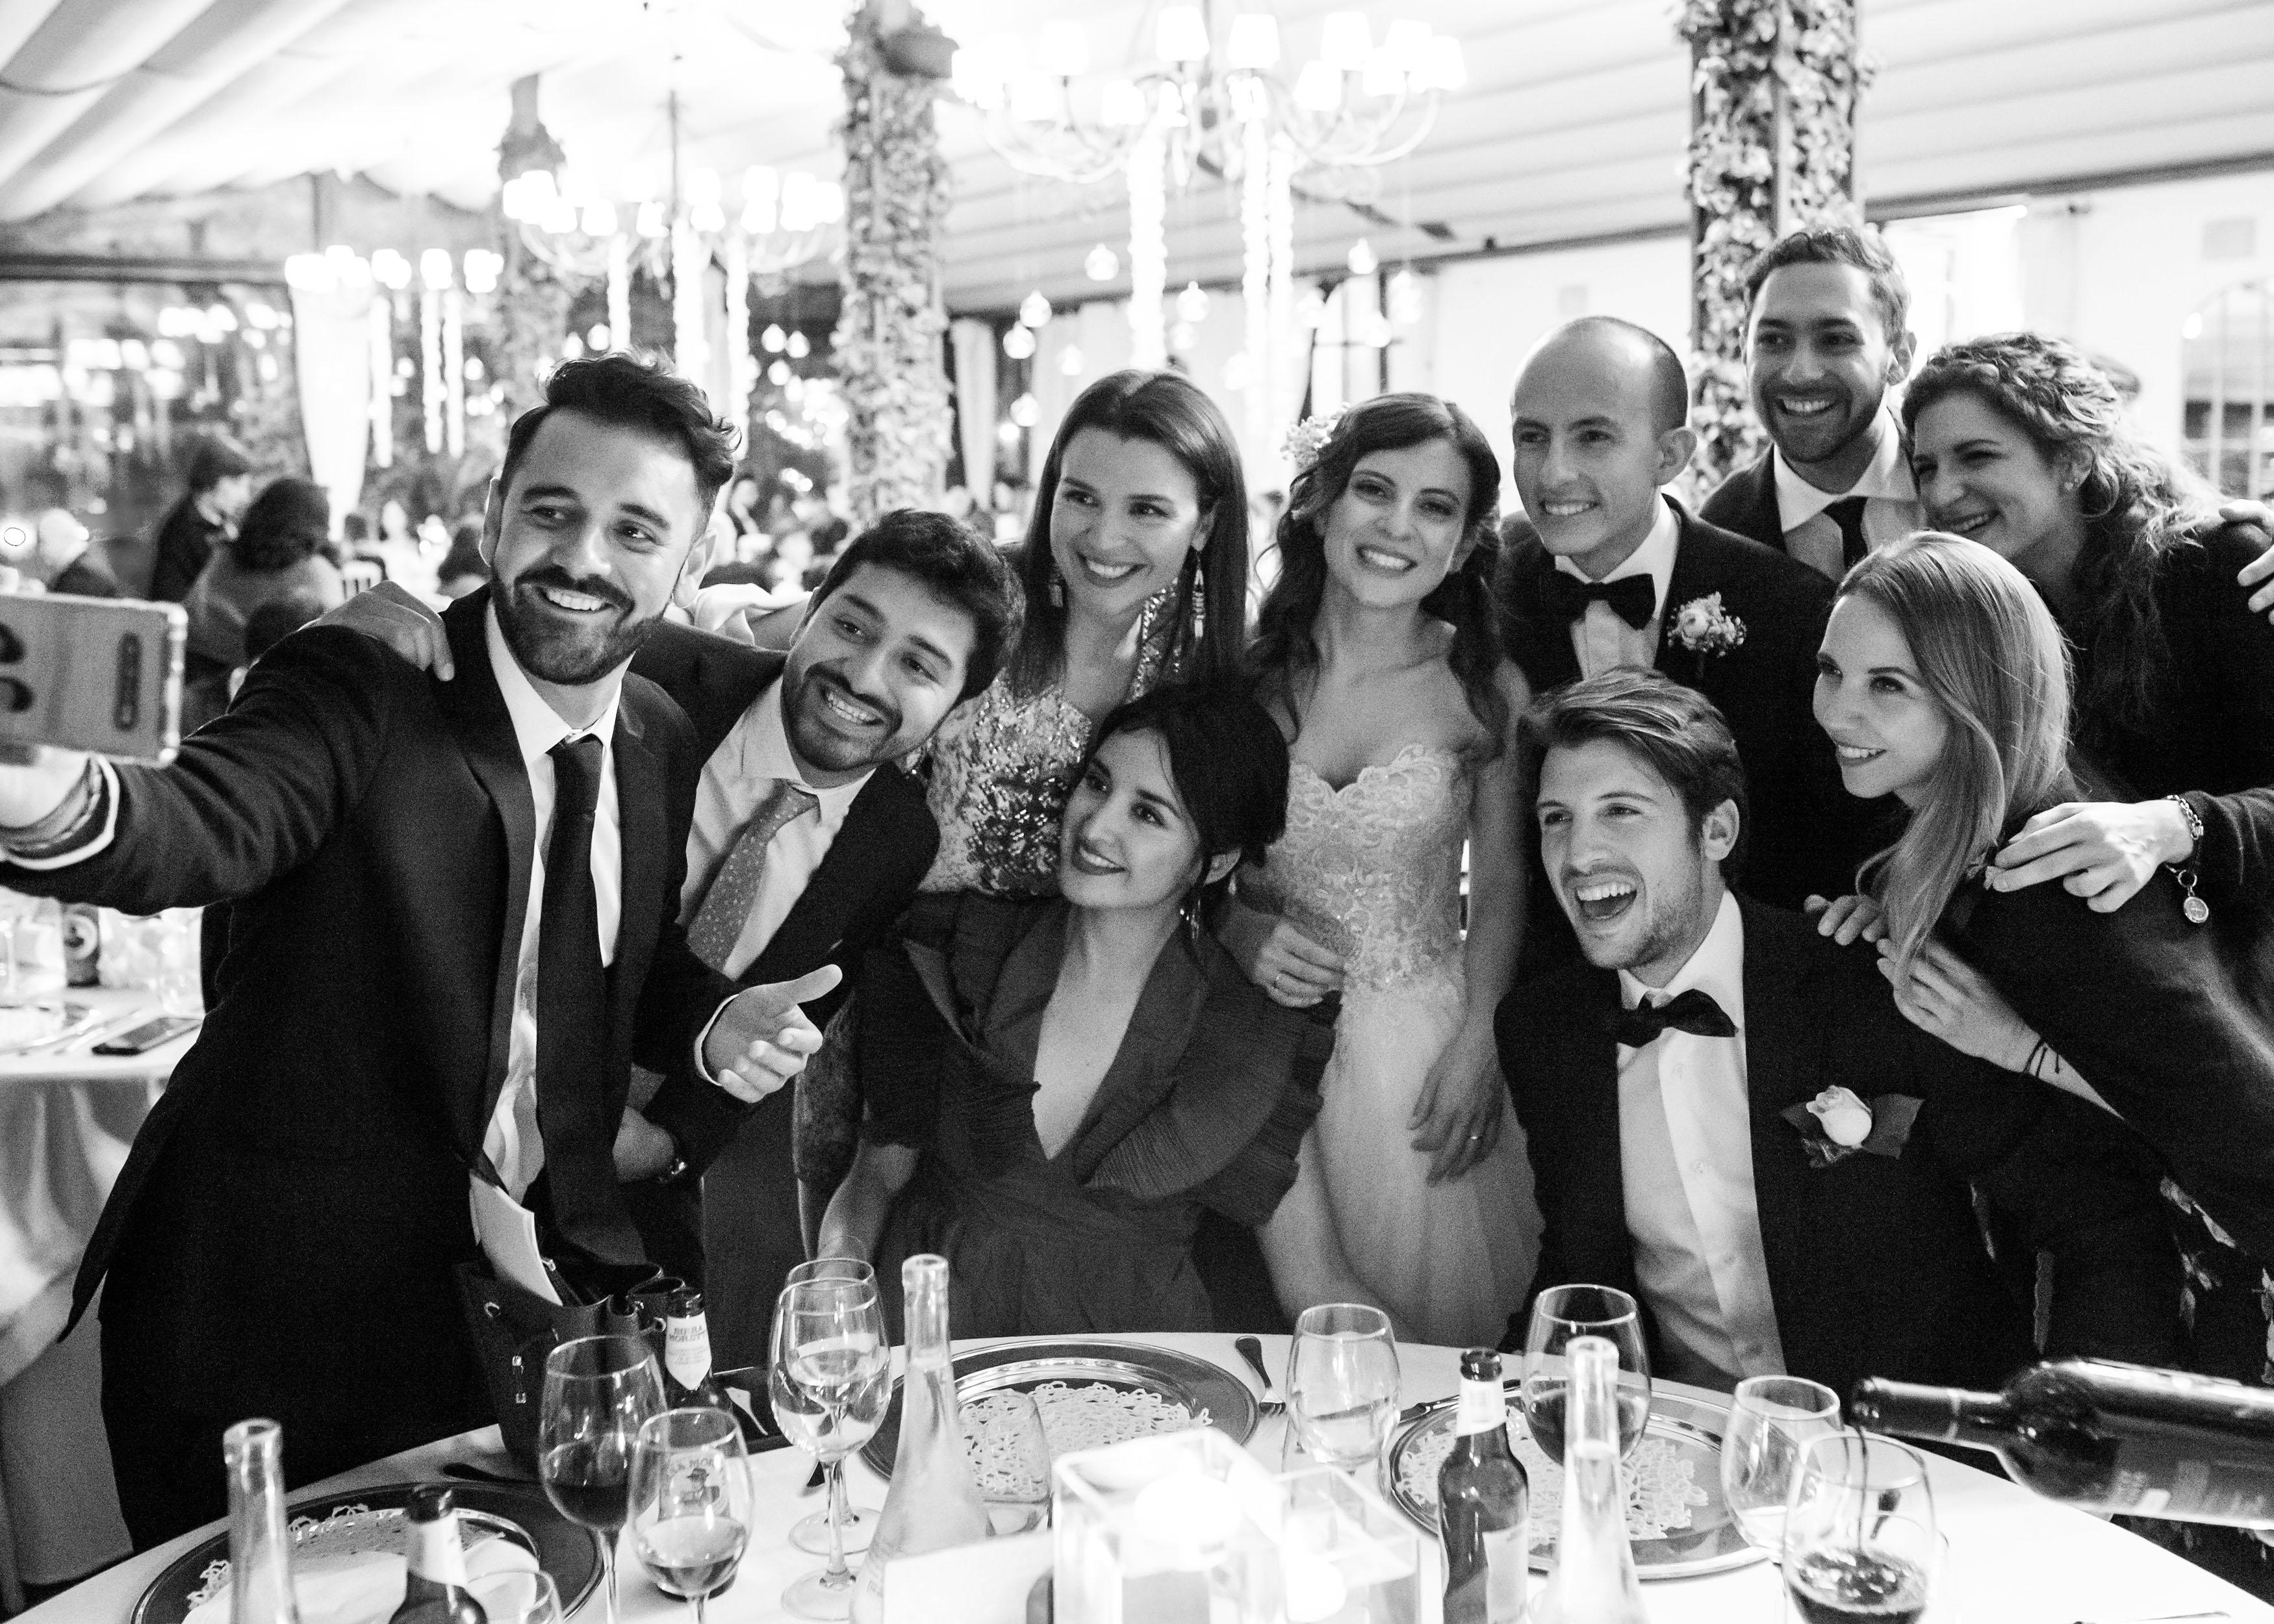 http://www.weddingamalfi.com/wp-content/uploads/Katia-Jorge-18-maggio-2019-44.jpg